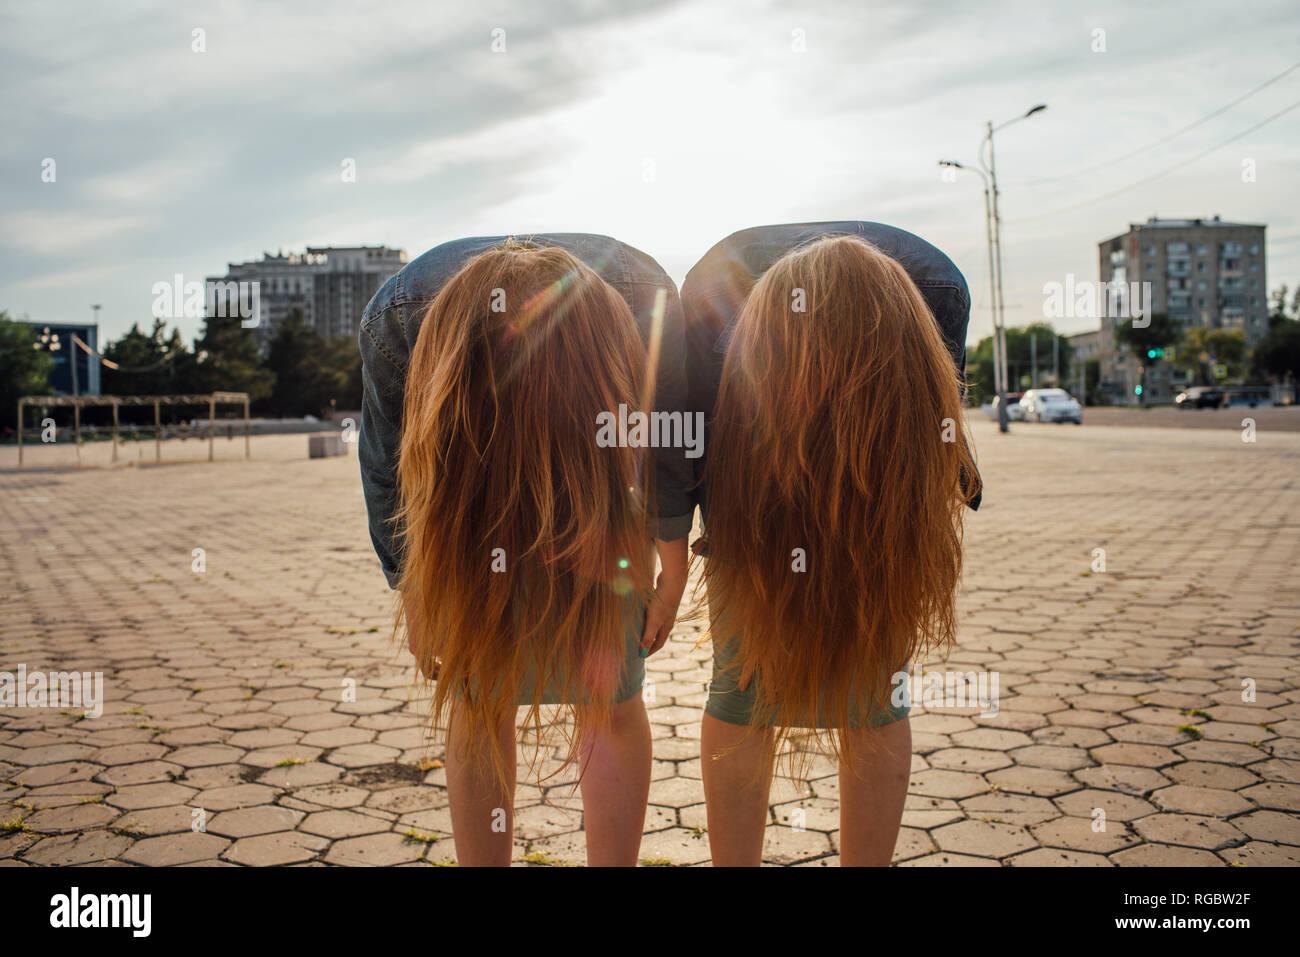 Redheaded twins in the city, headbangen - Stock Image